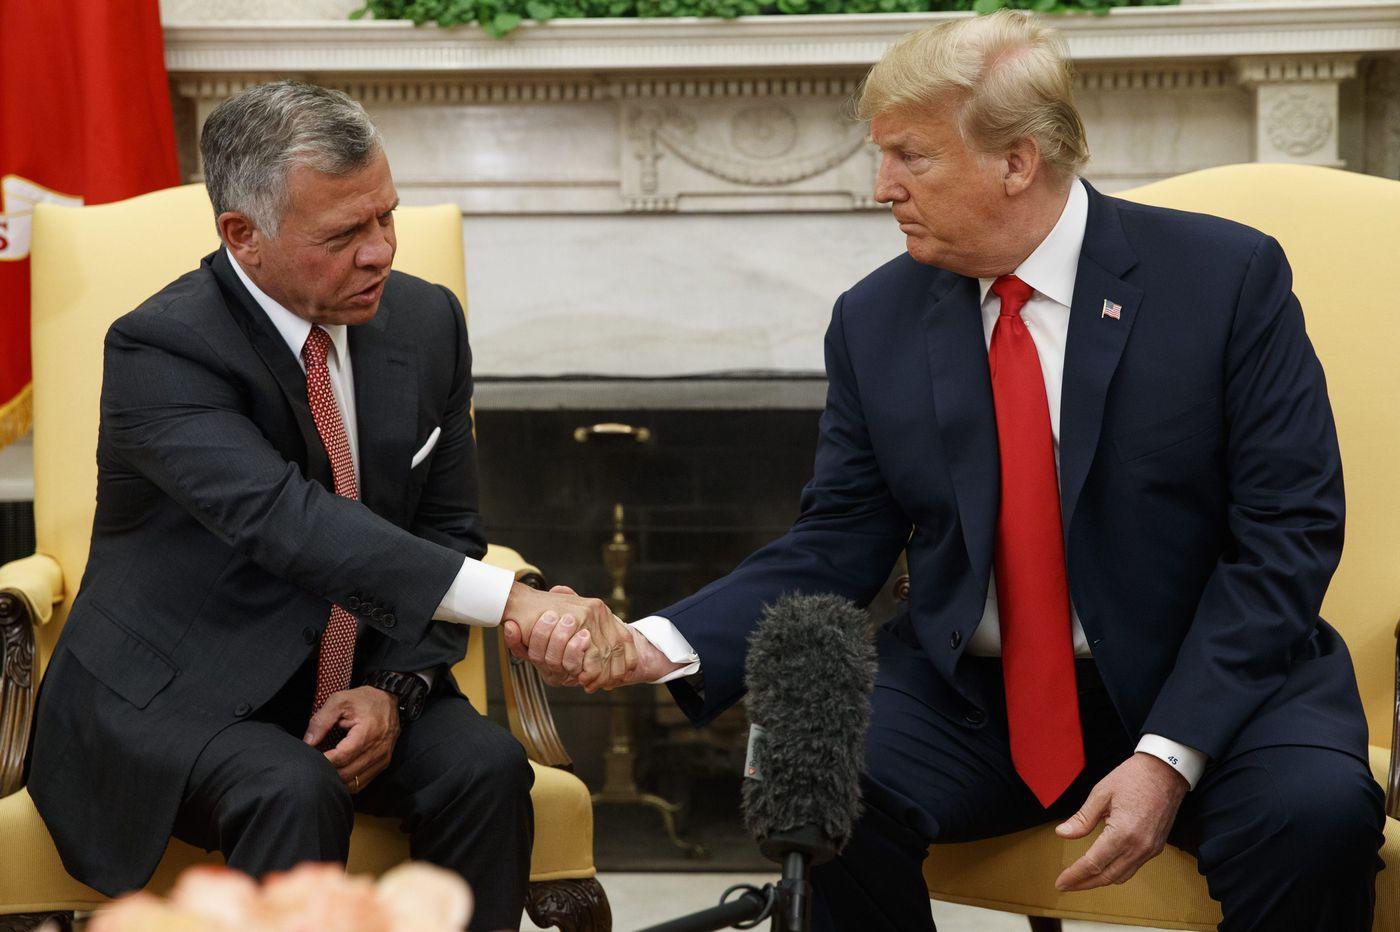 Philly-based Templeton Foundation awards $1.45 million religion prize to Jordan's King Abdullah II